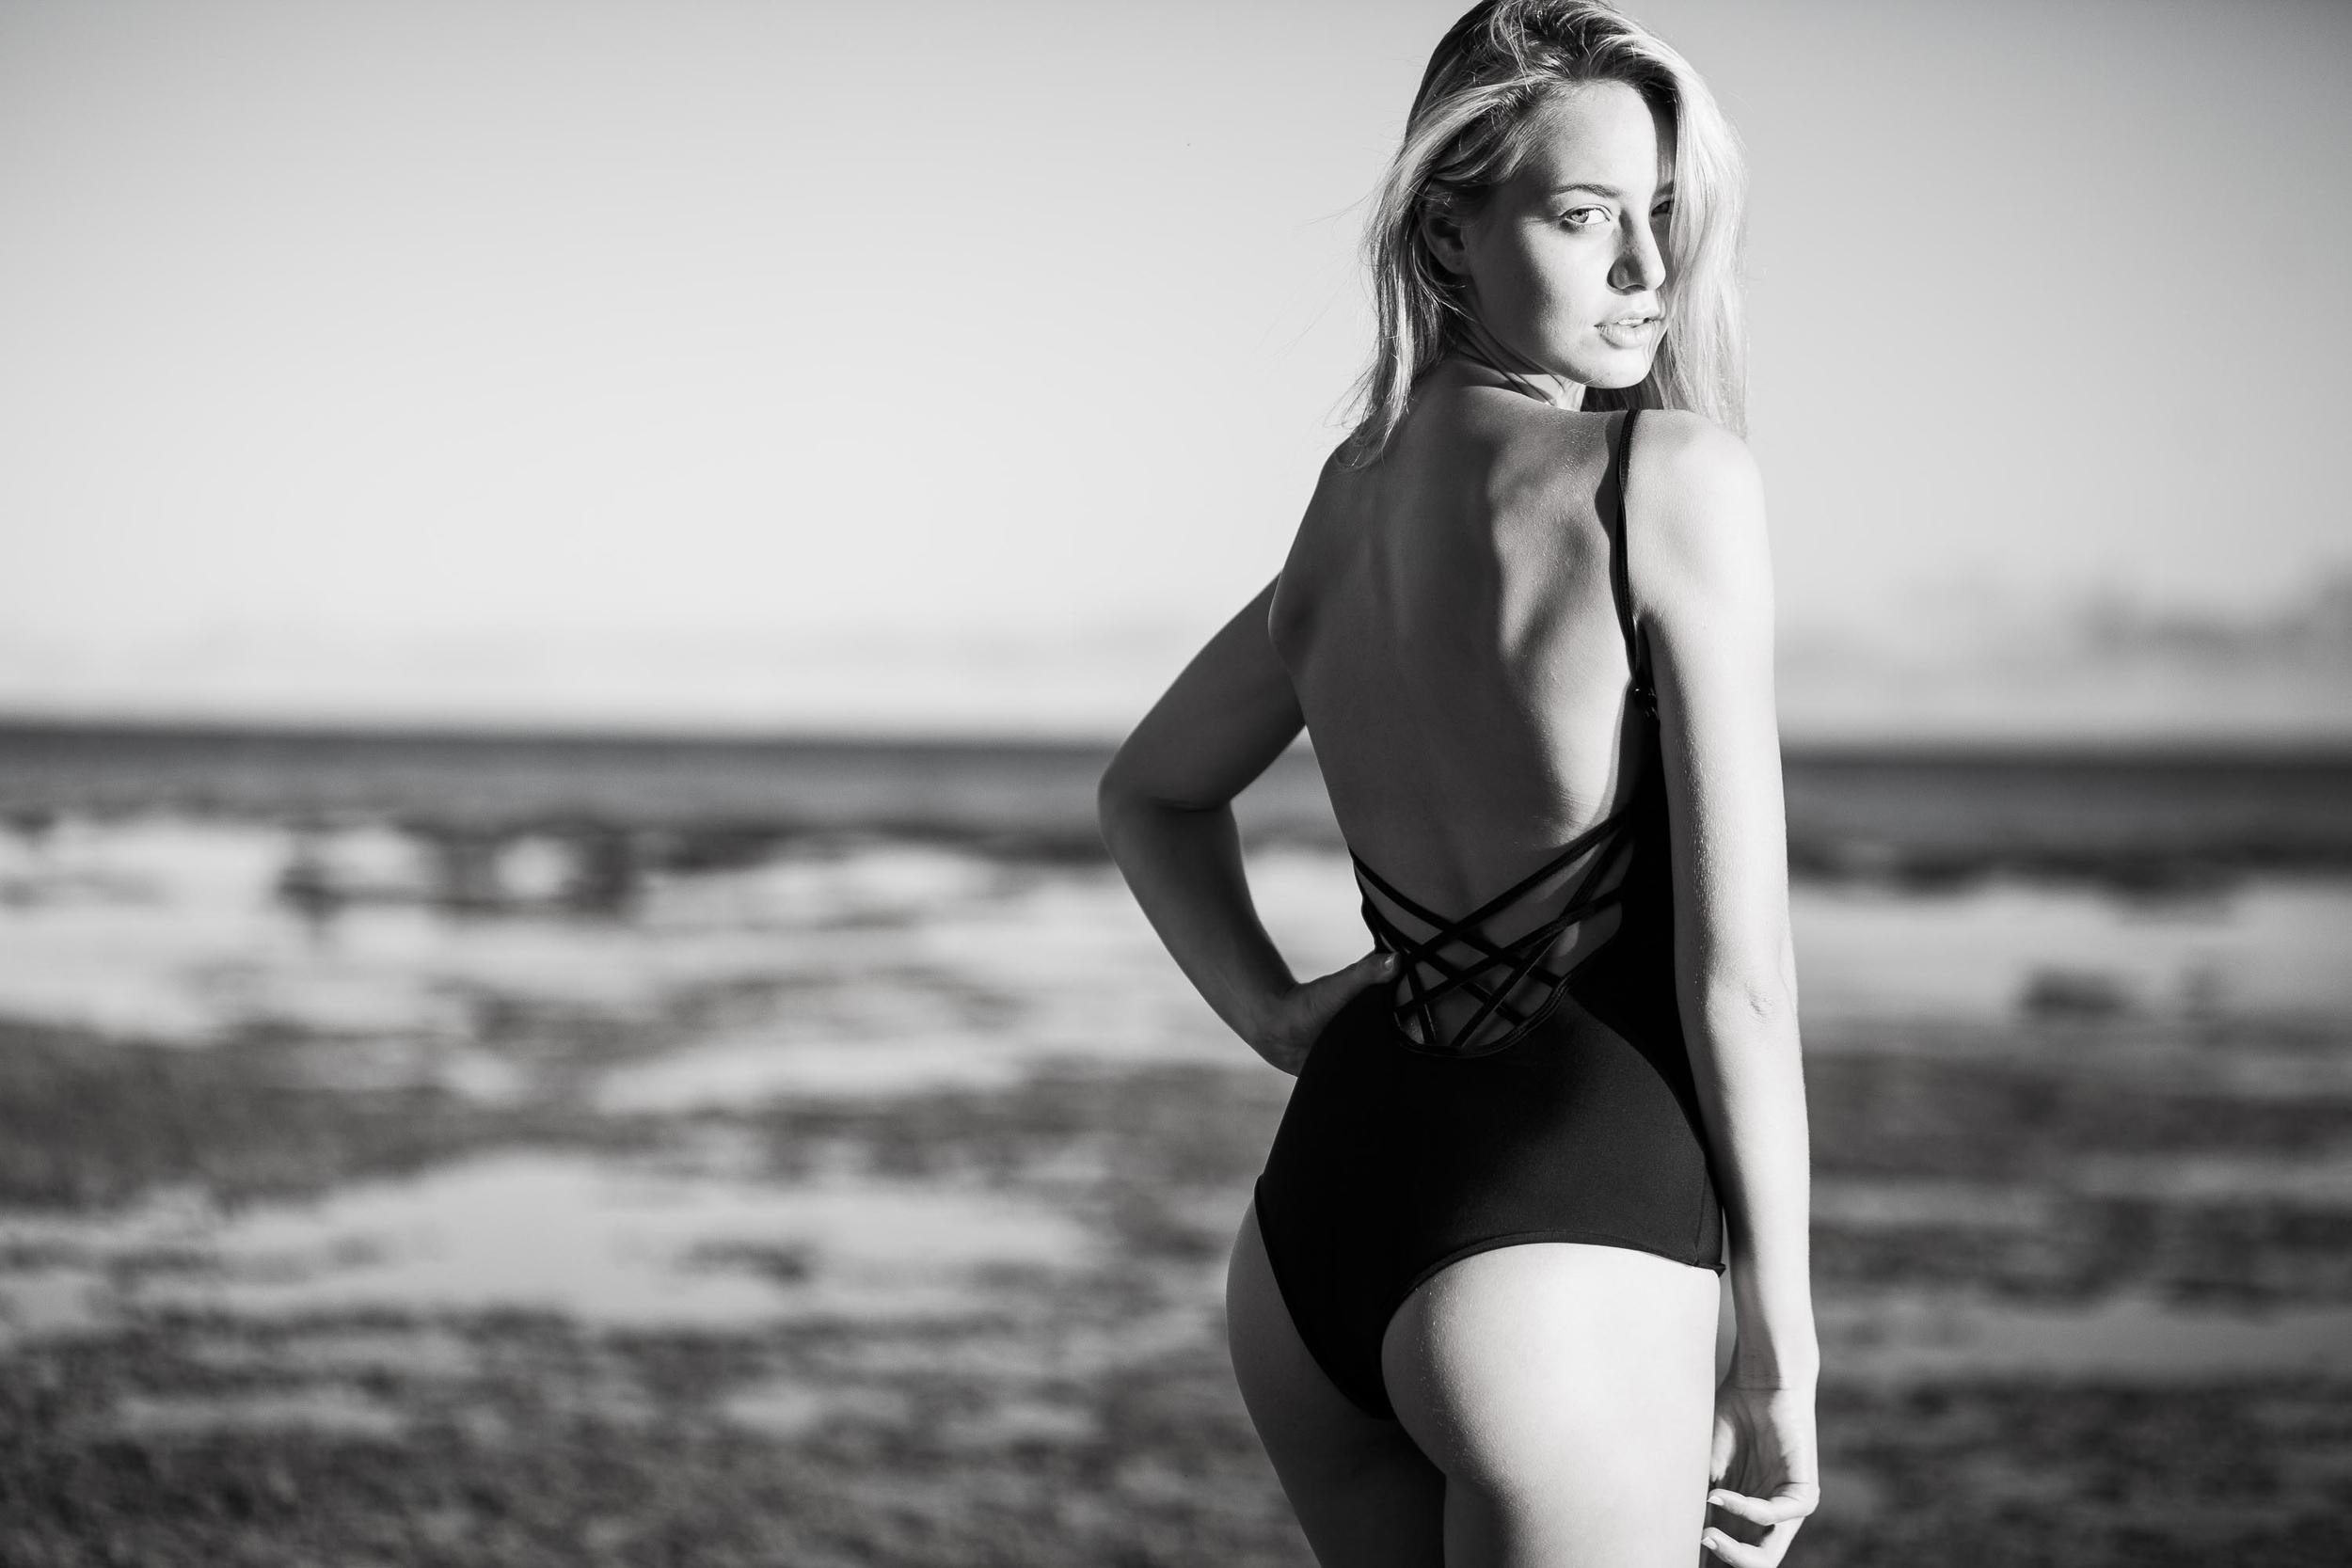 bryce-johnson-issademar-swimwear-gabby harrington-3.jpg